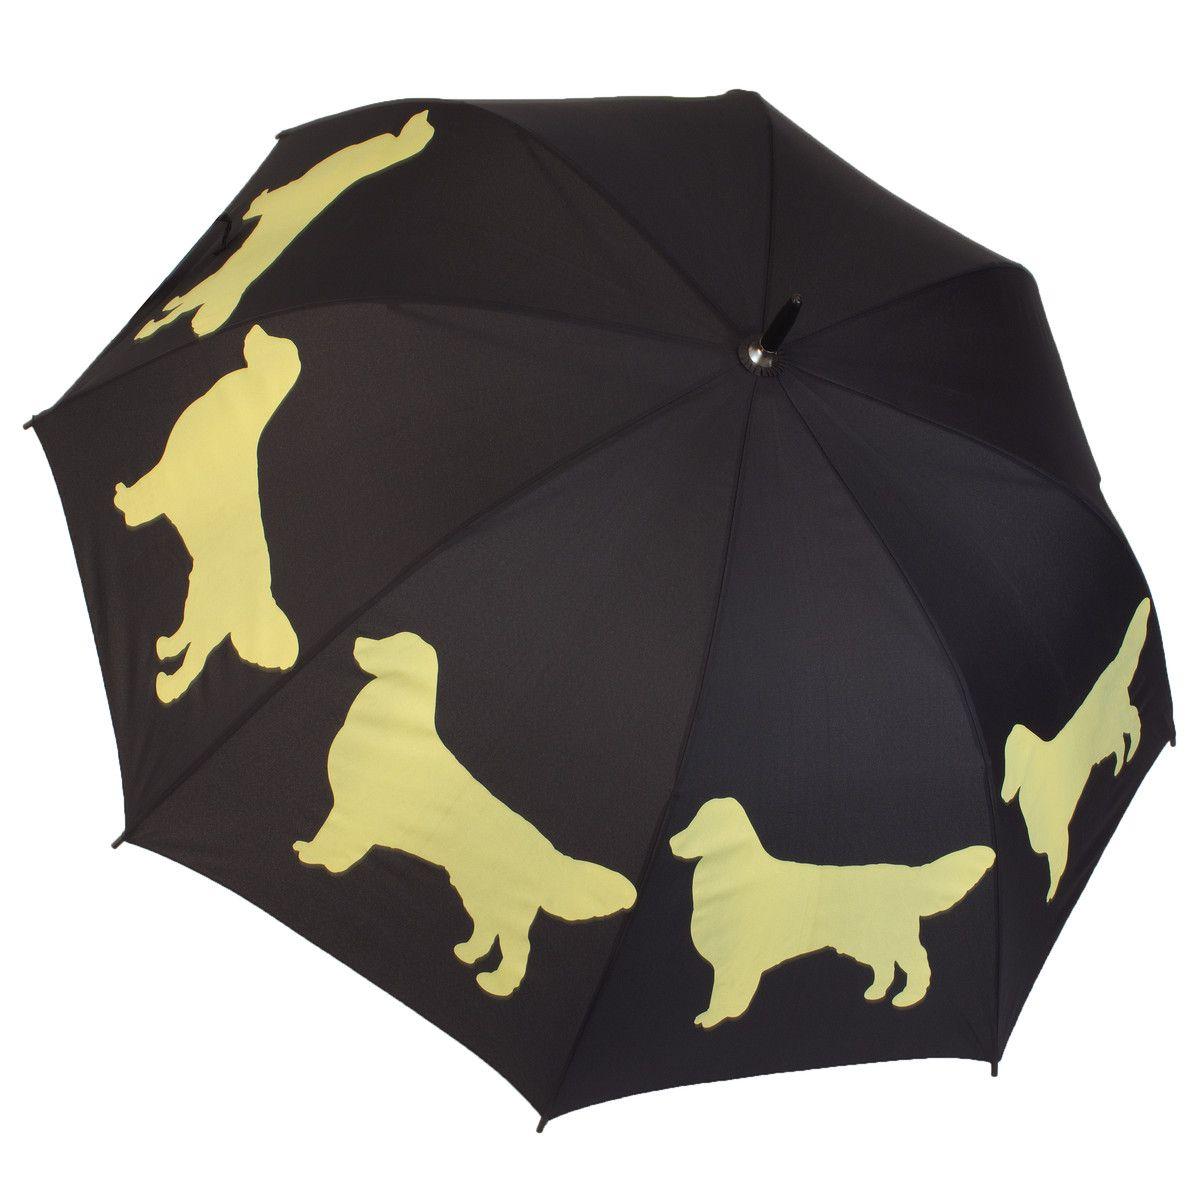 Golden Retriever Umbrella Golden retriever, Umbrella